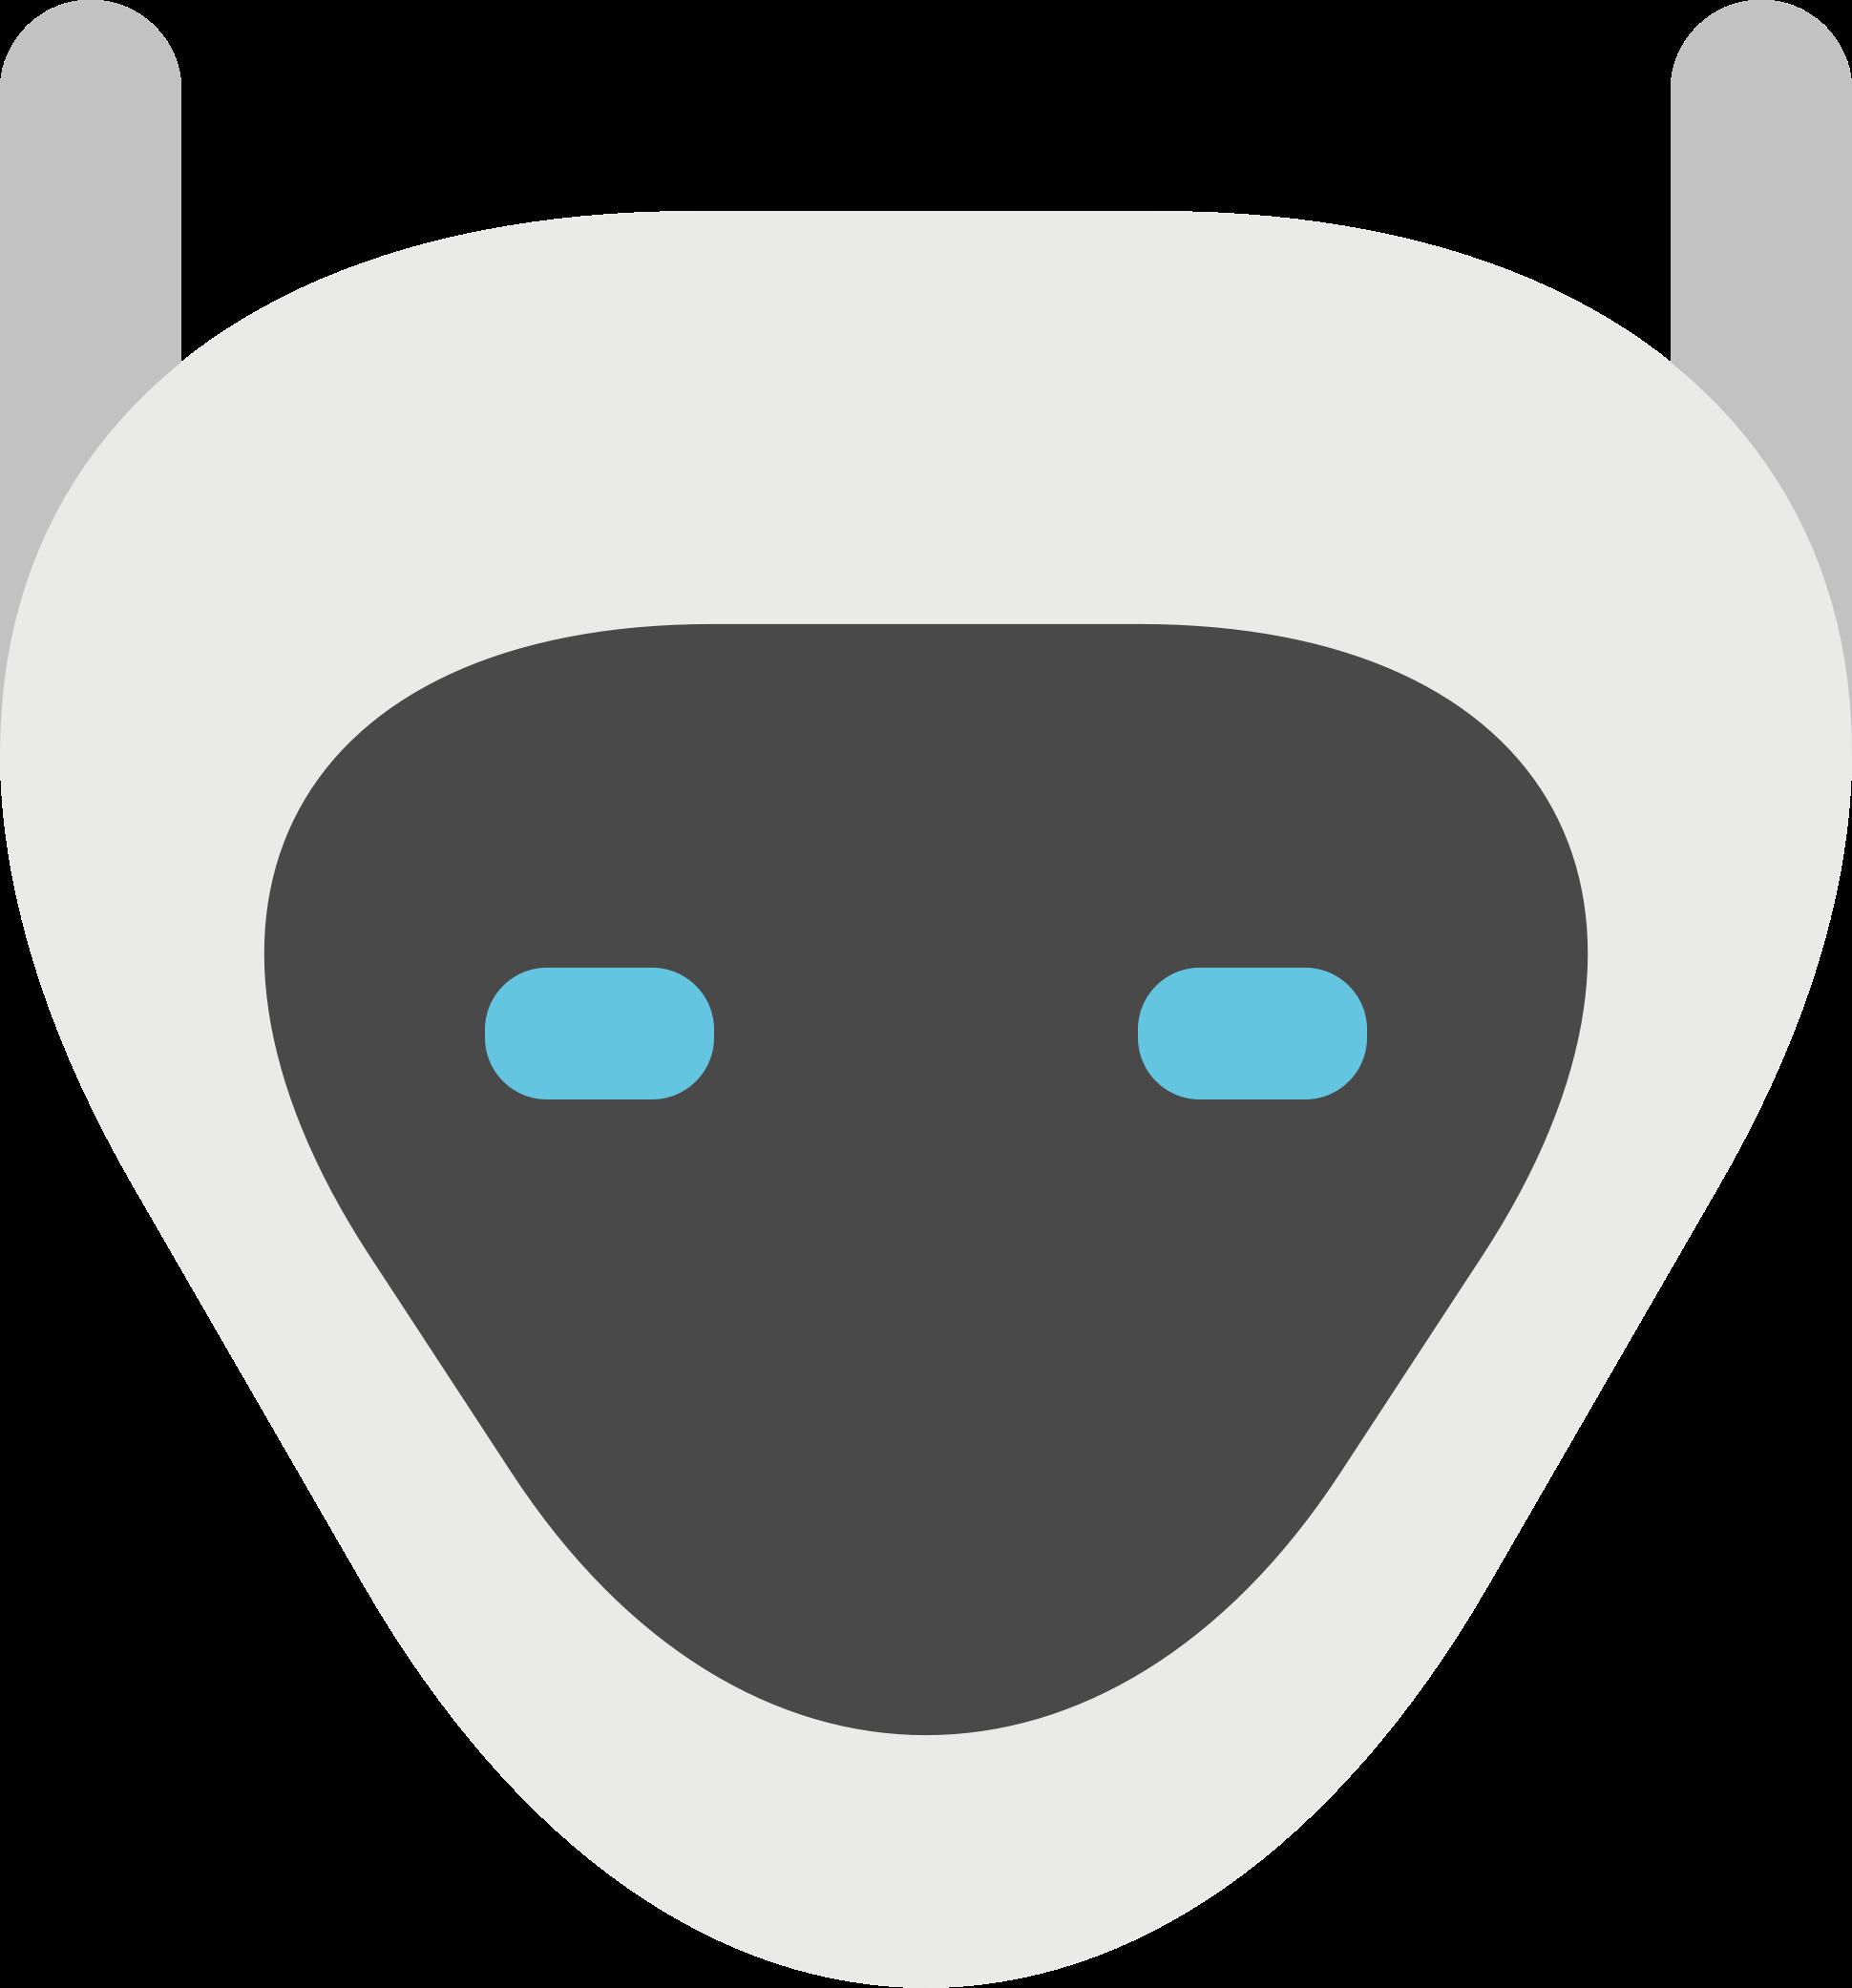 Clipart eye robot. Head big image png